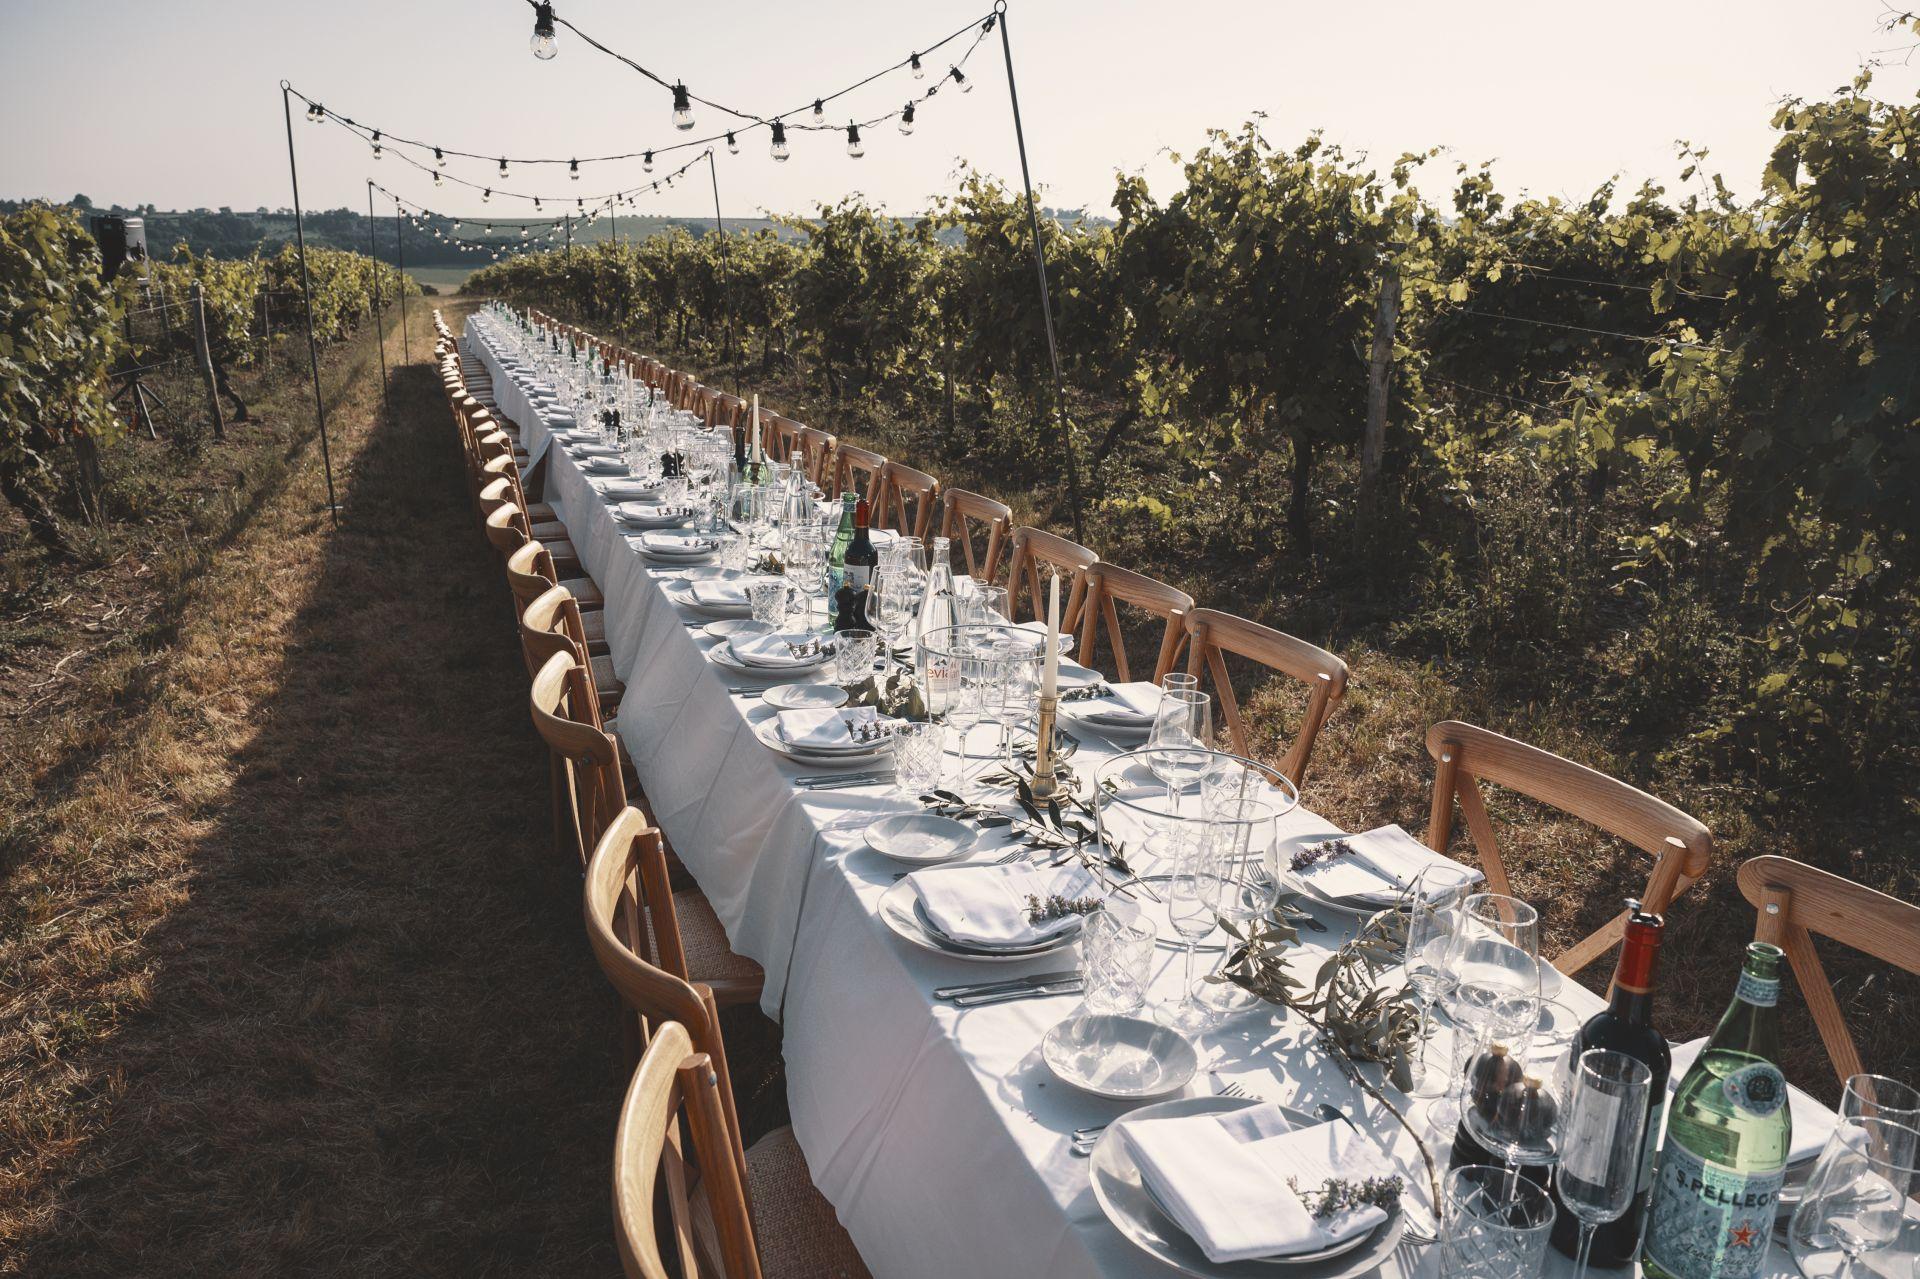 La Vue France - Wedding Breakfast- Table in Vineyard - StuJarvis.com